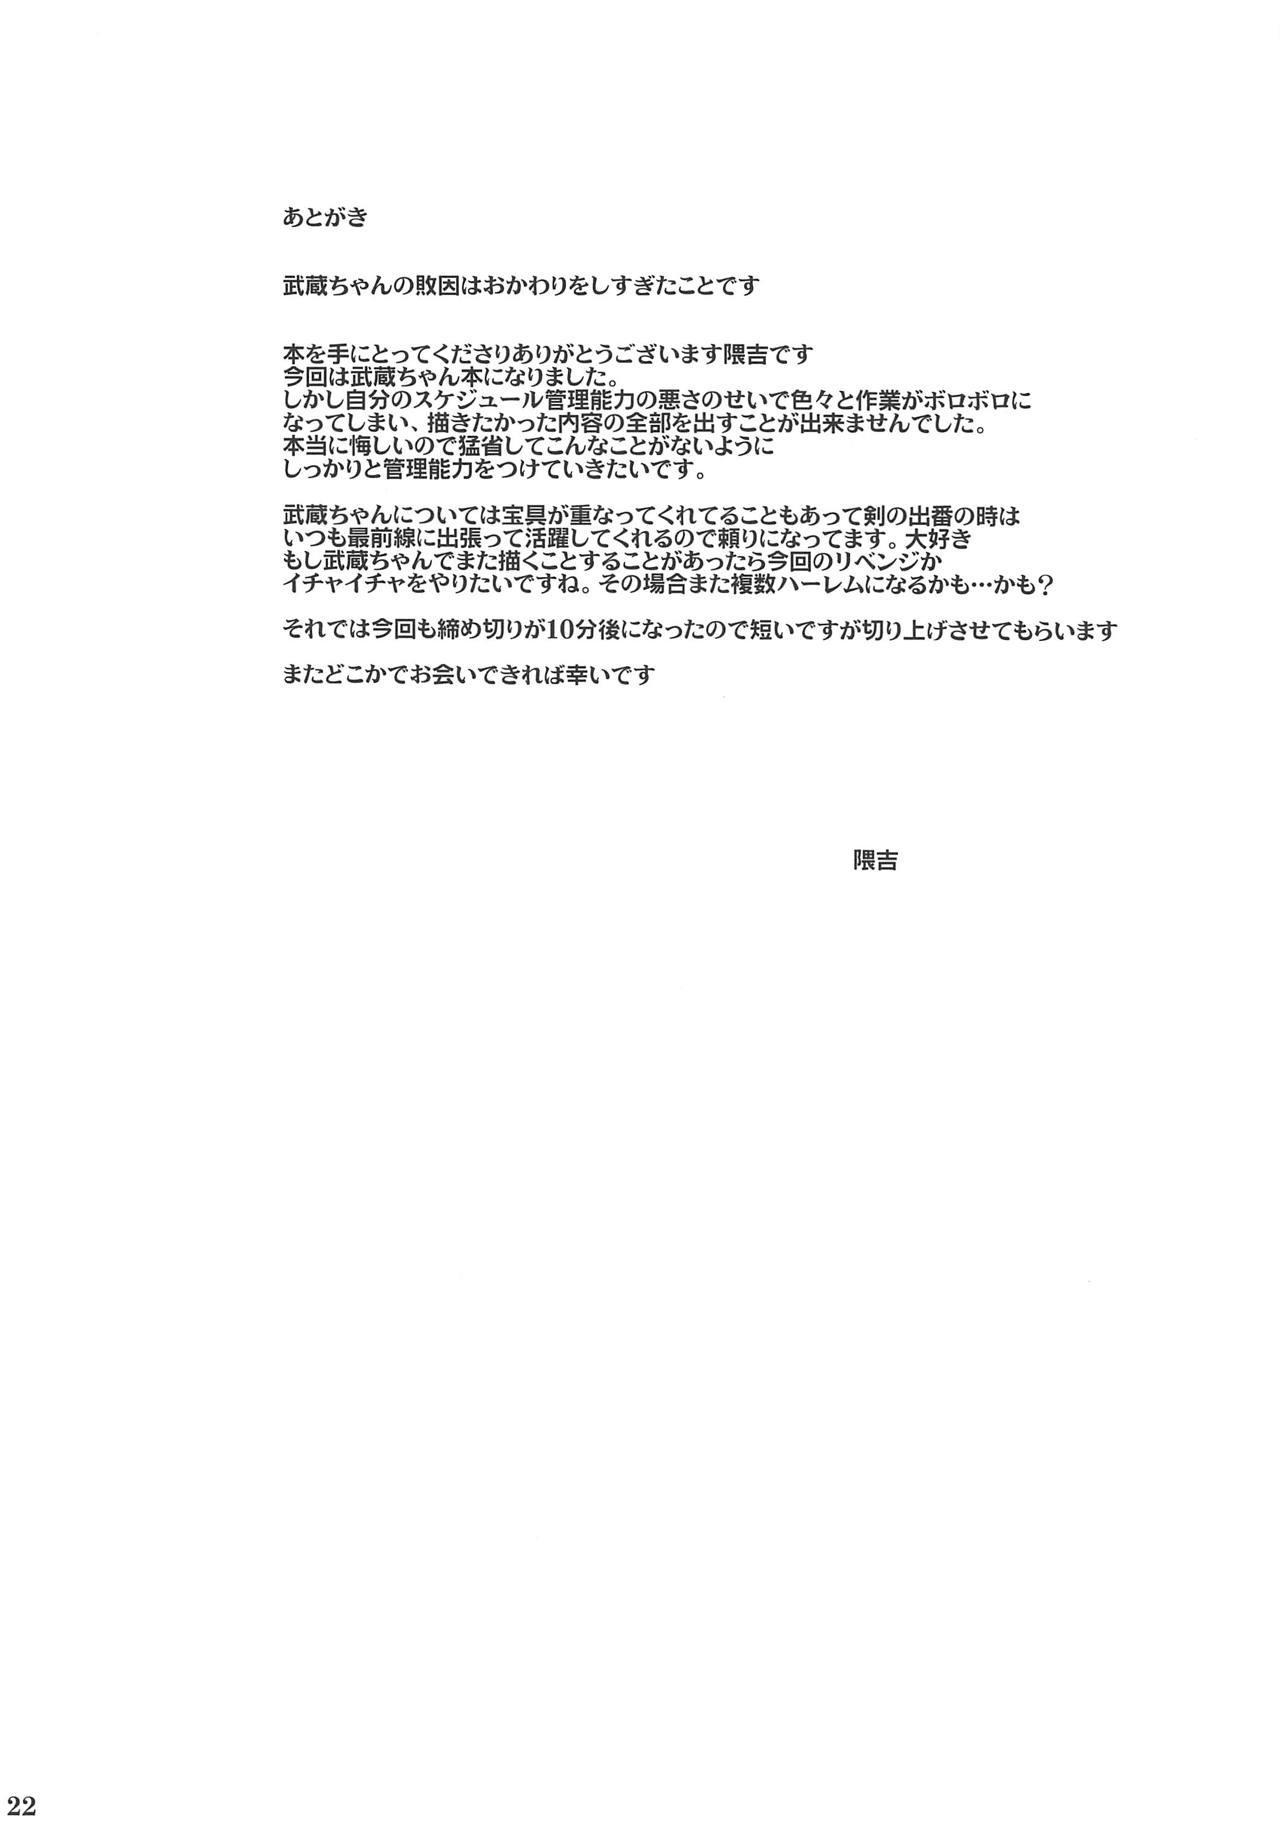 (COMIC1☆15) [Tamagobou (Kumakiti)] Musashi-chan Oji-san ni Kussuru (Fate/Grand Order) [Chinese] [新桥月白日语社] 23